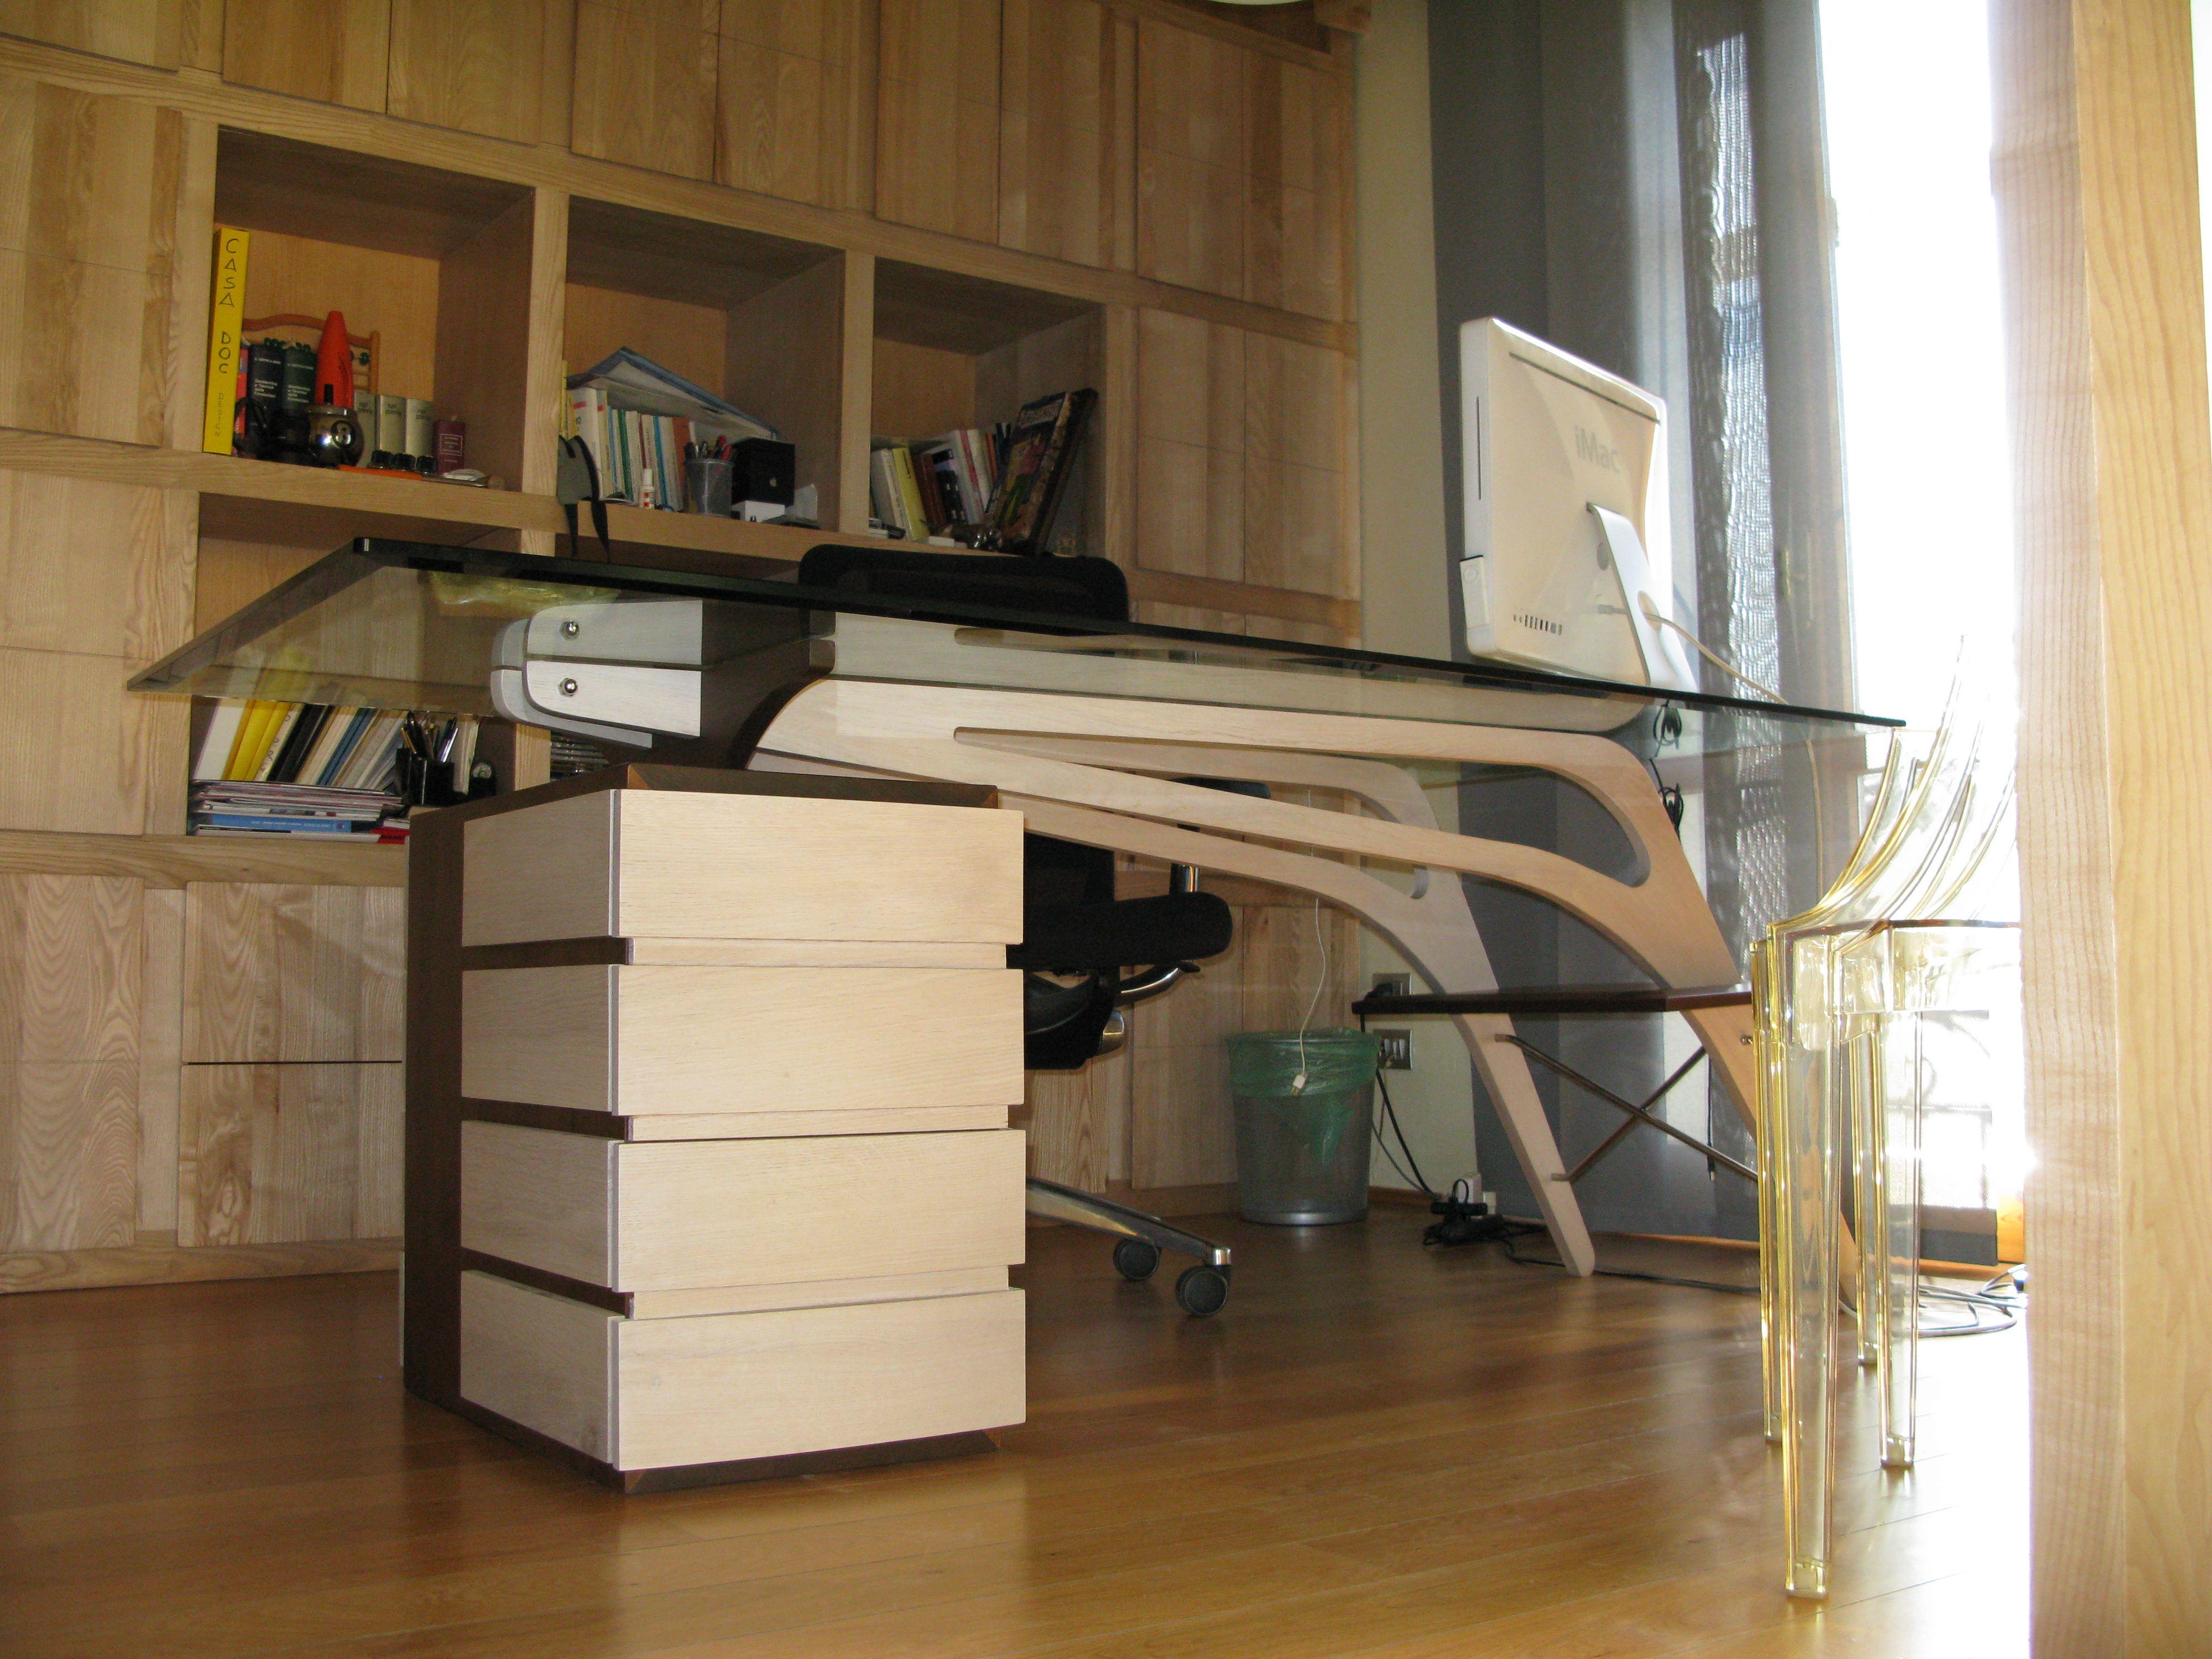 Scrivania libreria studio arredamento studio legnoeoltre for Mobile scrivania libreria